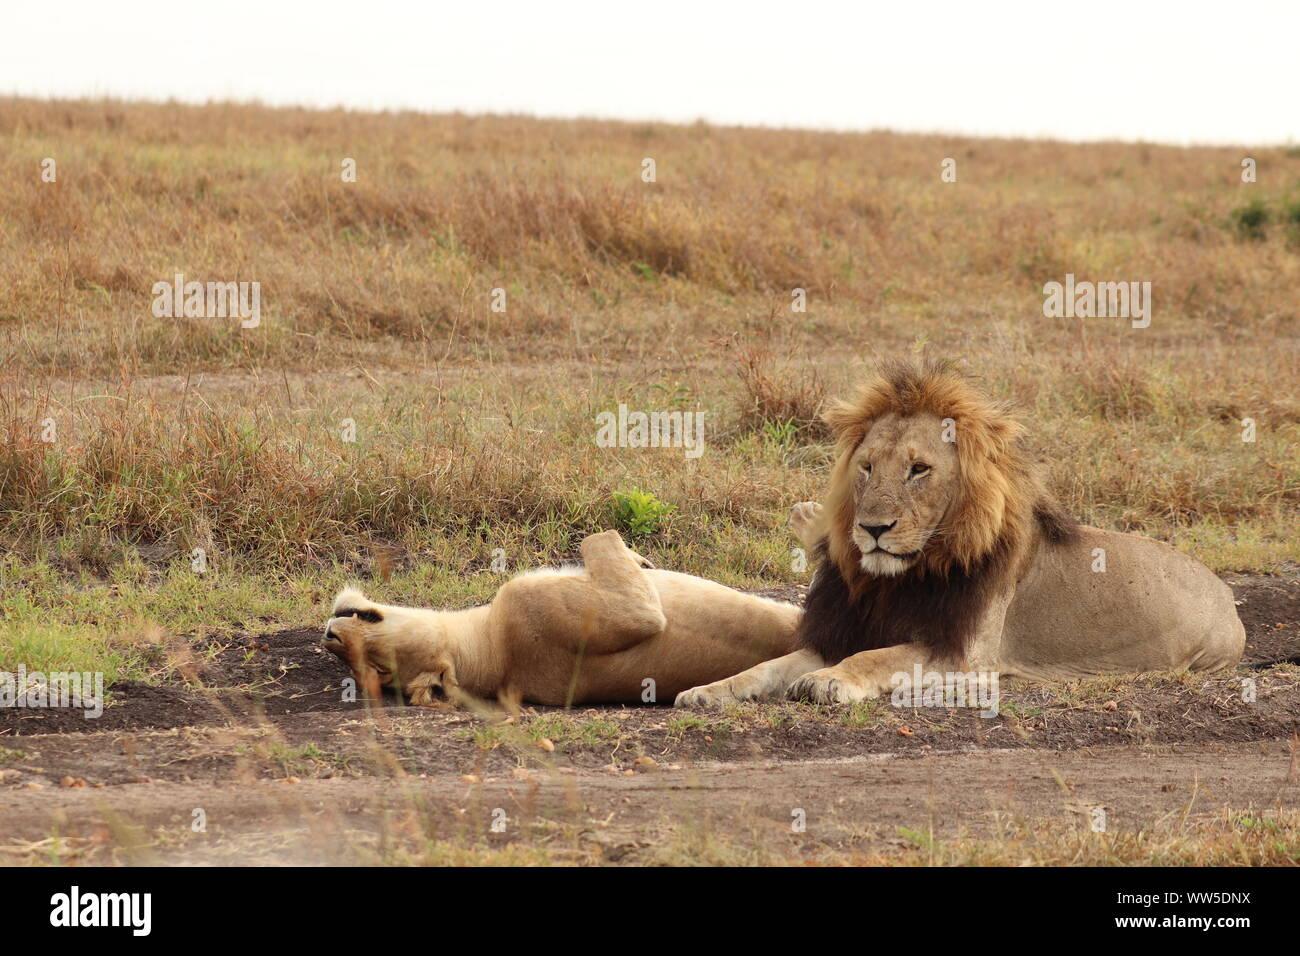 Lion and lioness in the savannah, Masai Mara National Park, Kenya. Stock Photo